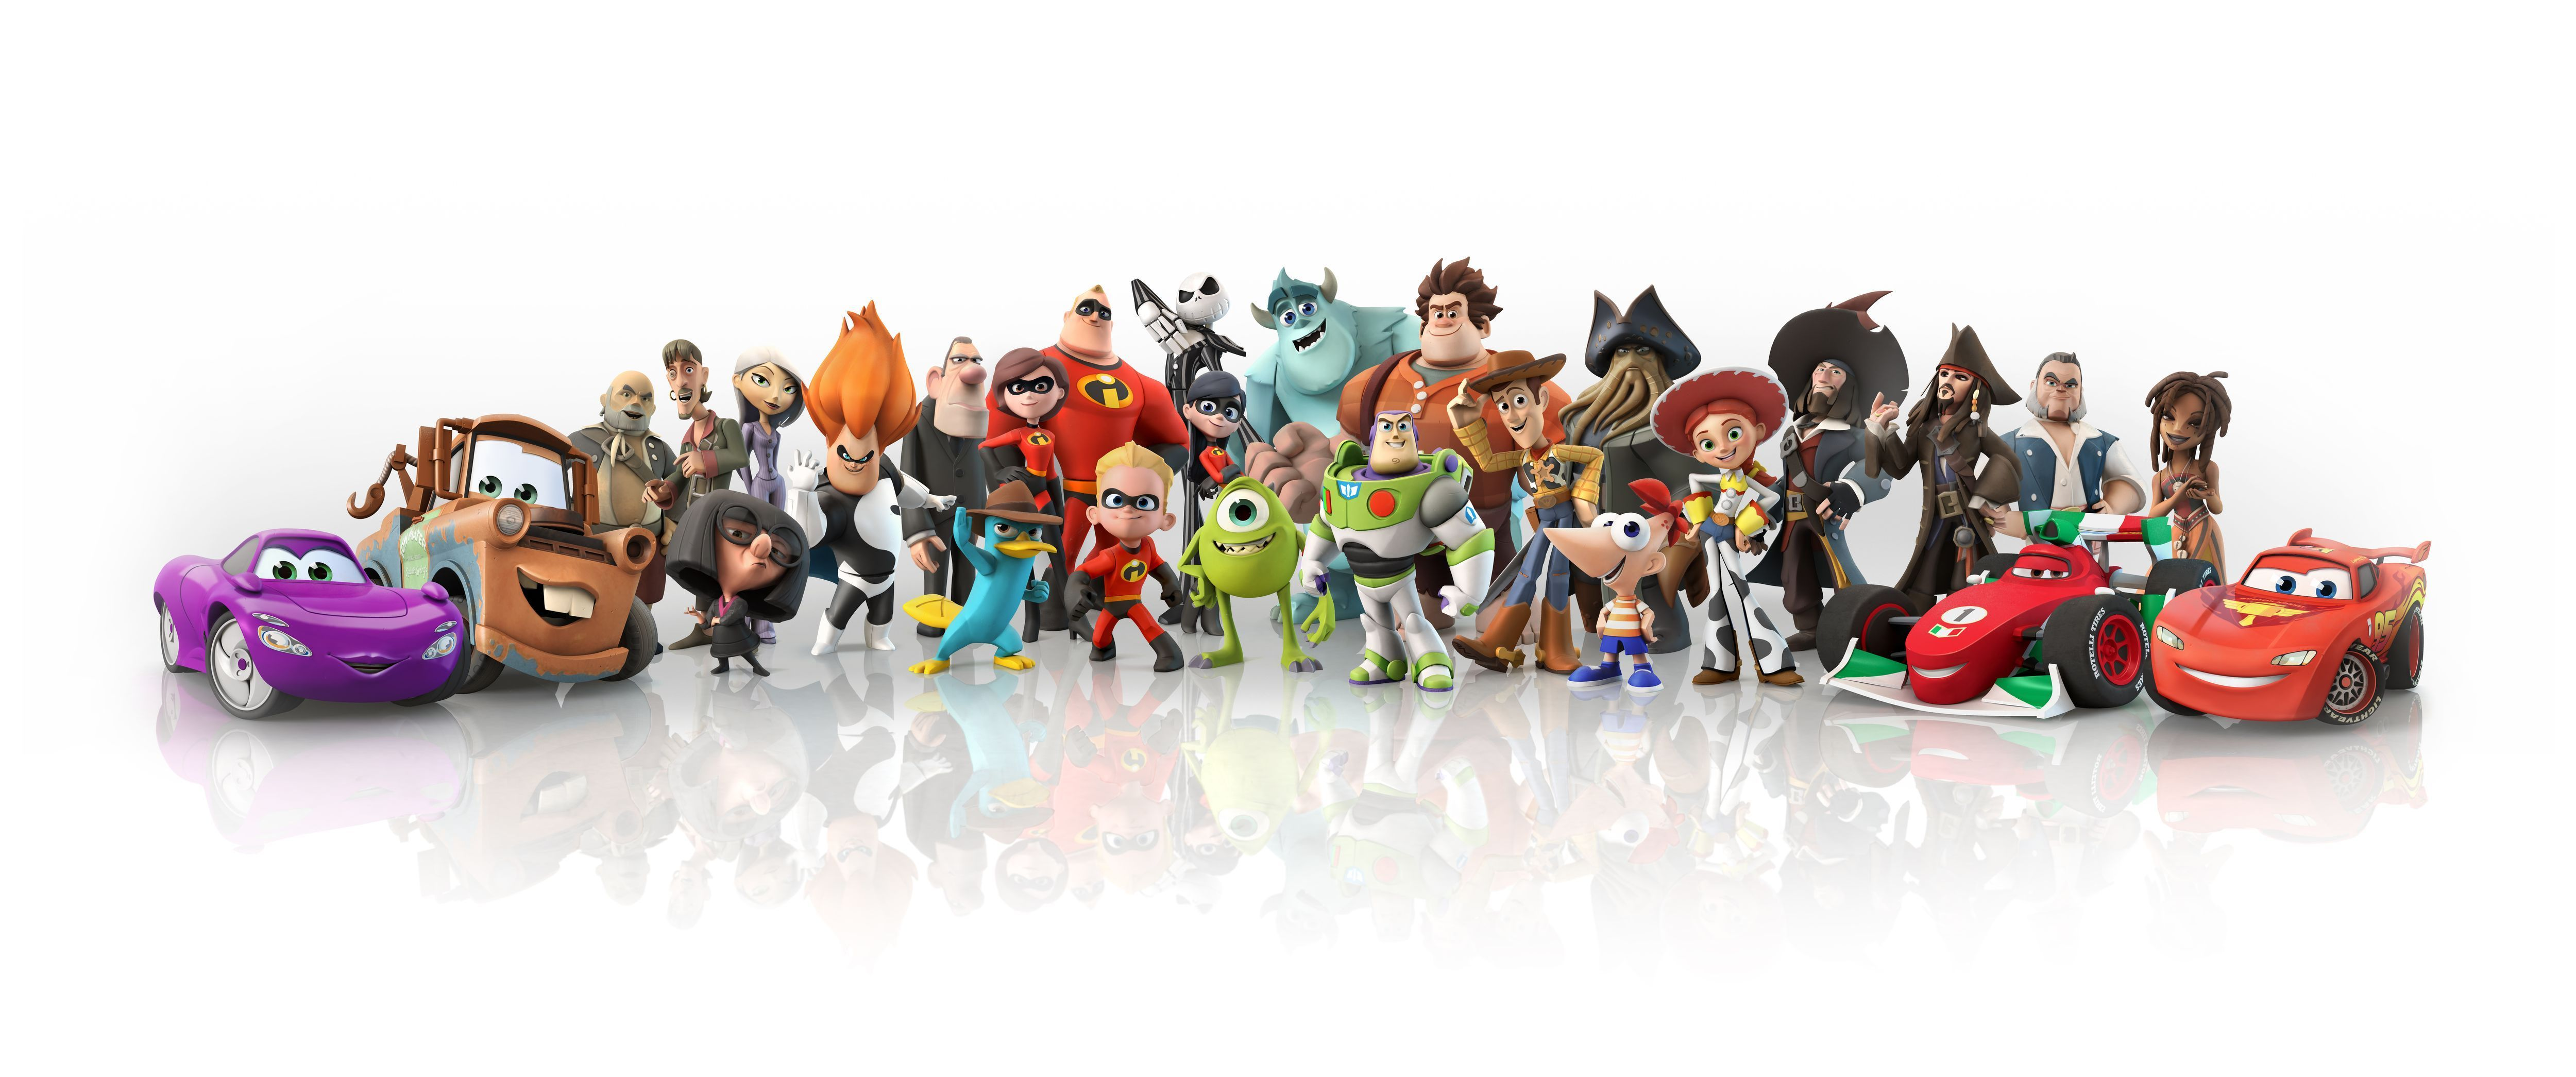 Pixar Characters Wallpapers Top Free Pixar Characters Backgrounds Wallpaperaccess